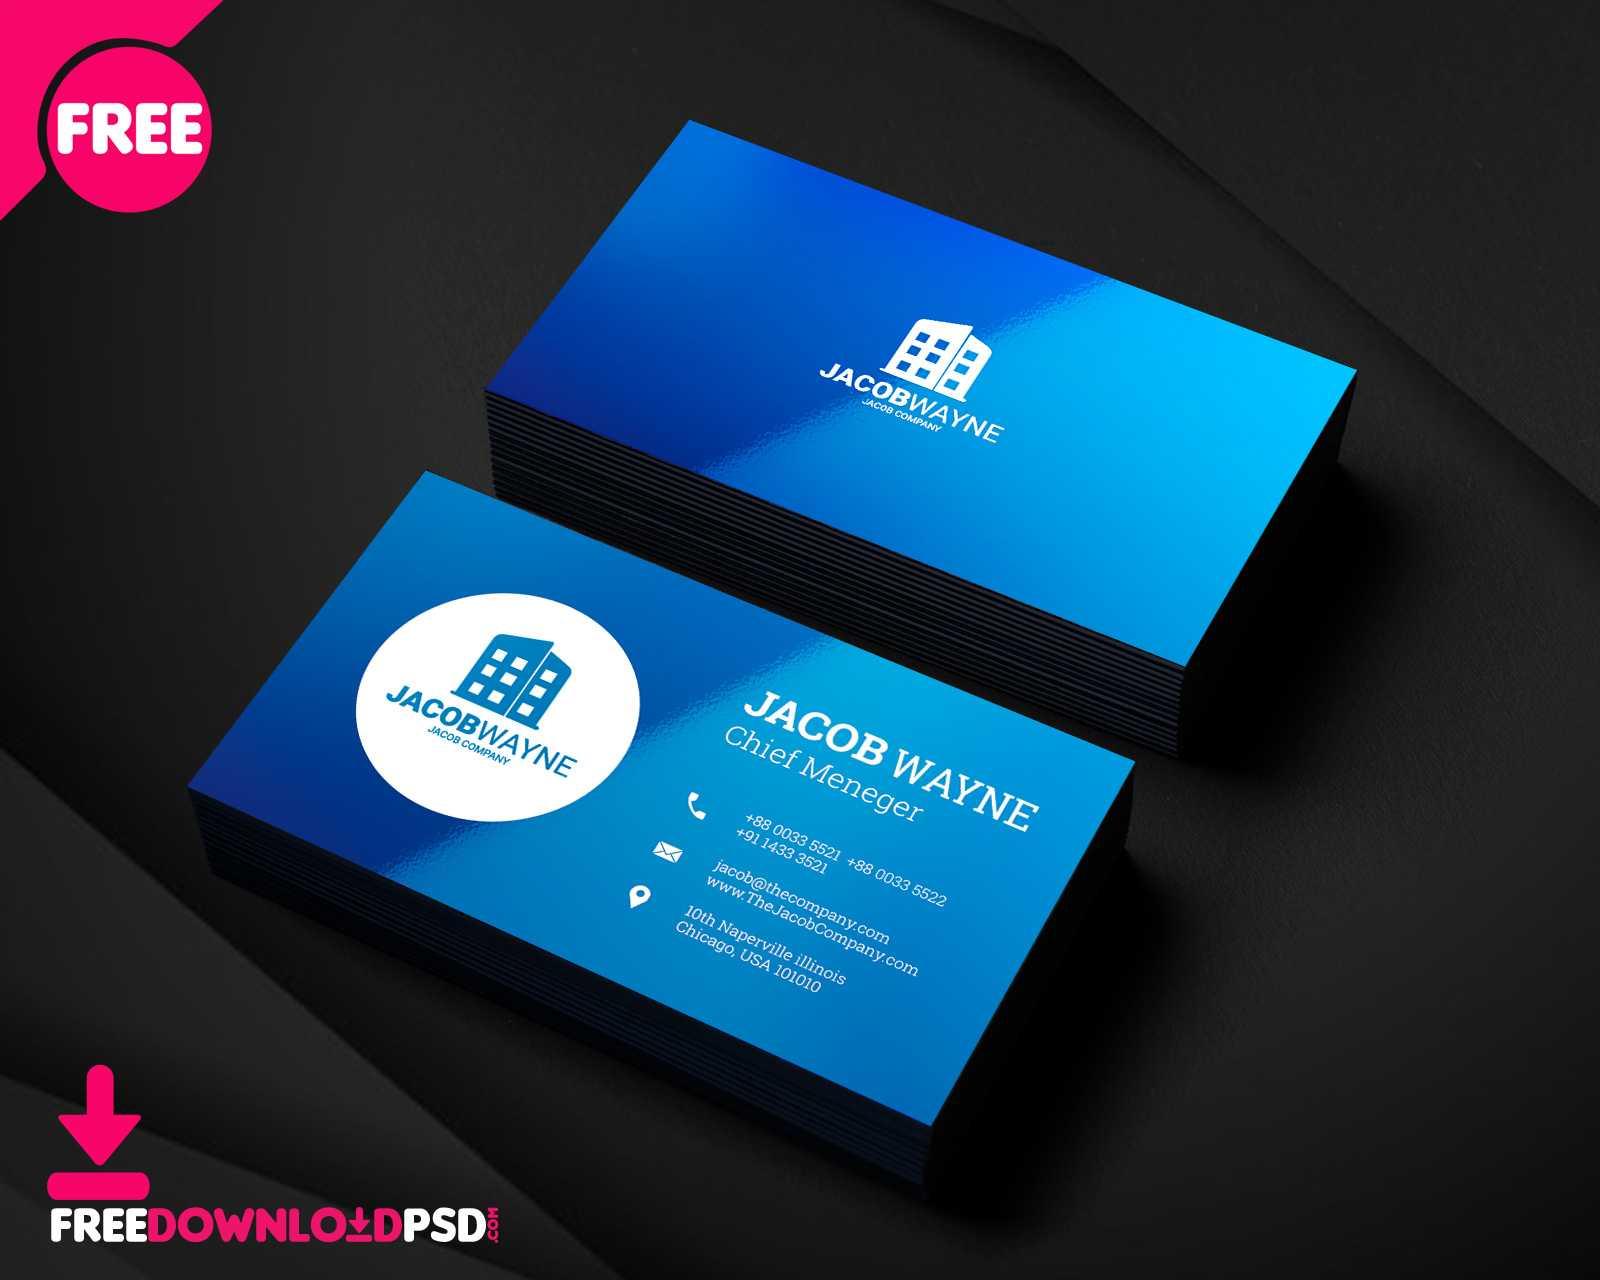 Real Estate Business Card Psd   Freedownloadpsd regarding Visiting Card Psd Template